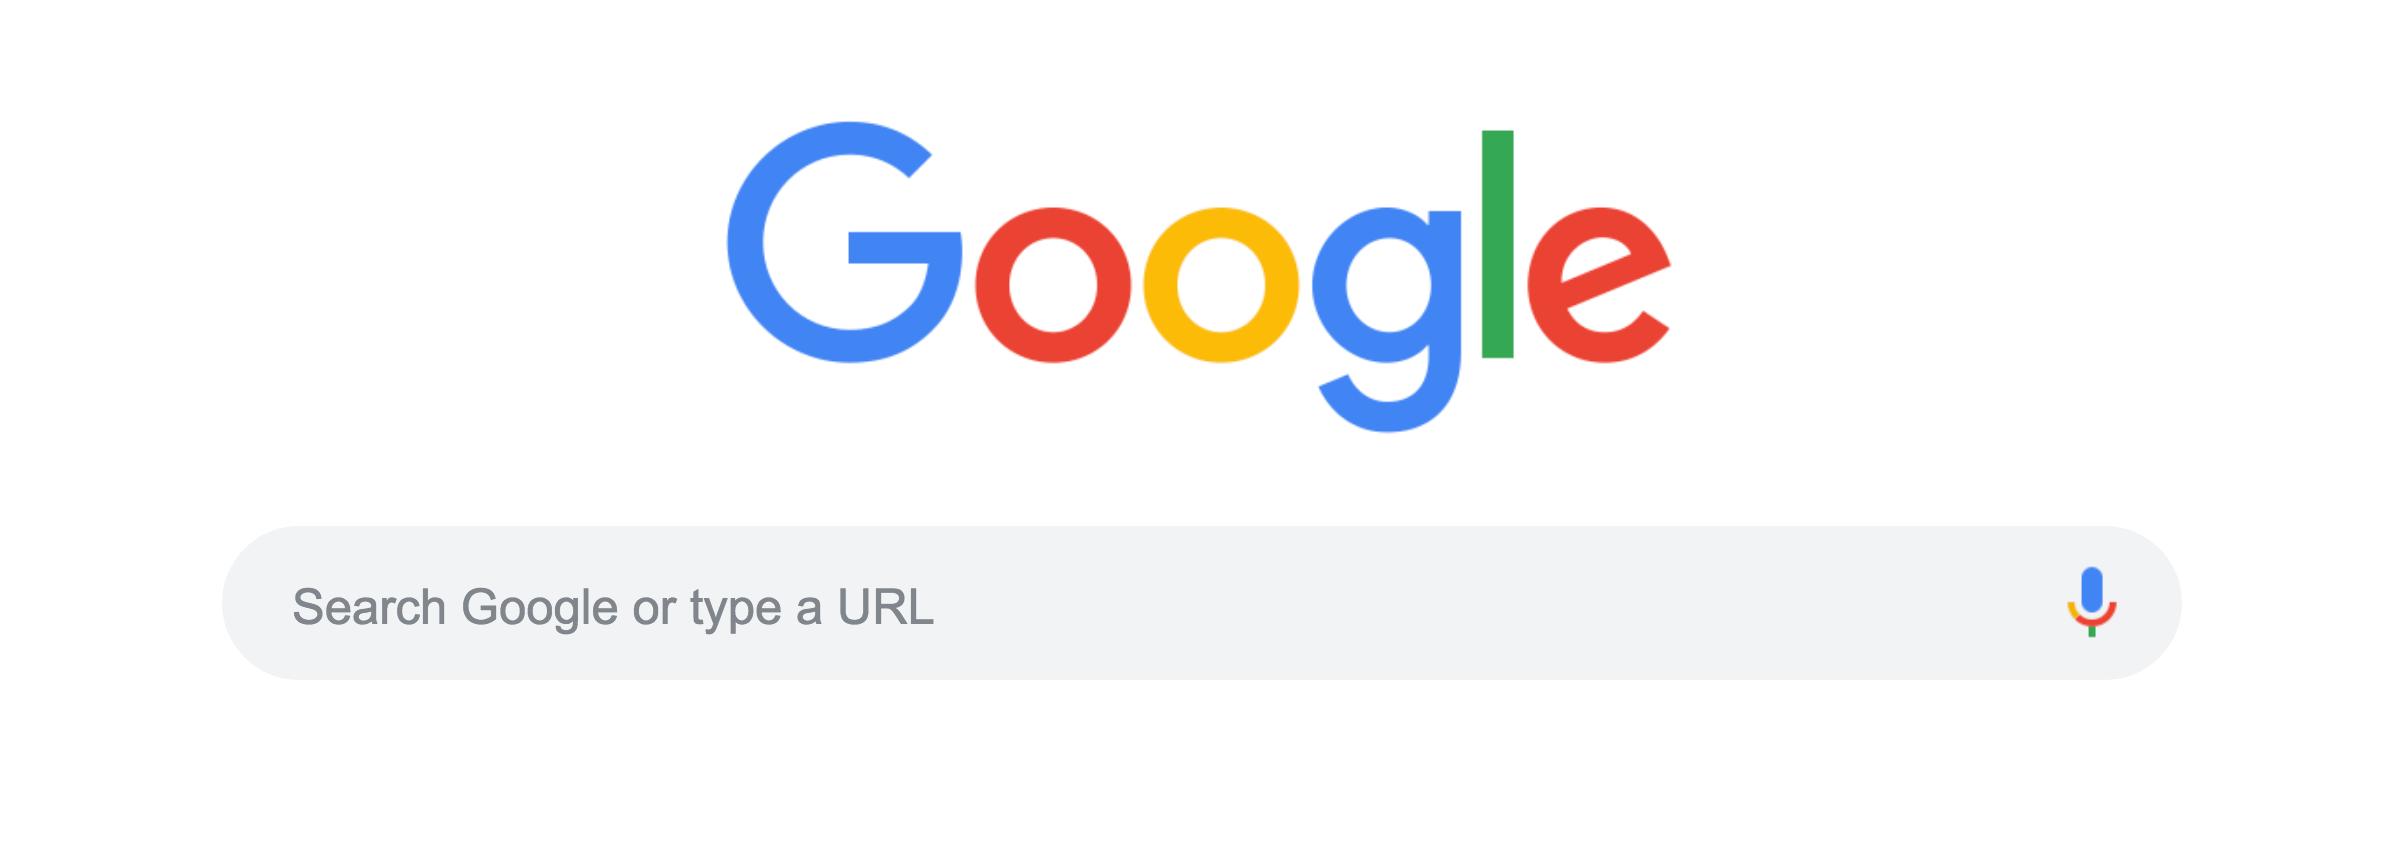 Google Business, don't ignore it, take advantage of Free Marketing